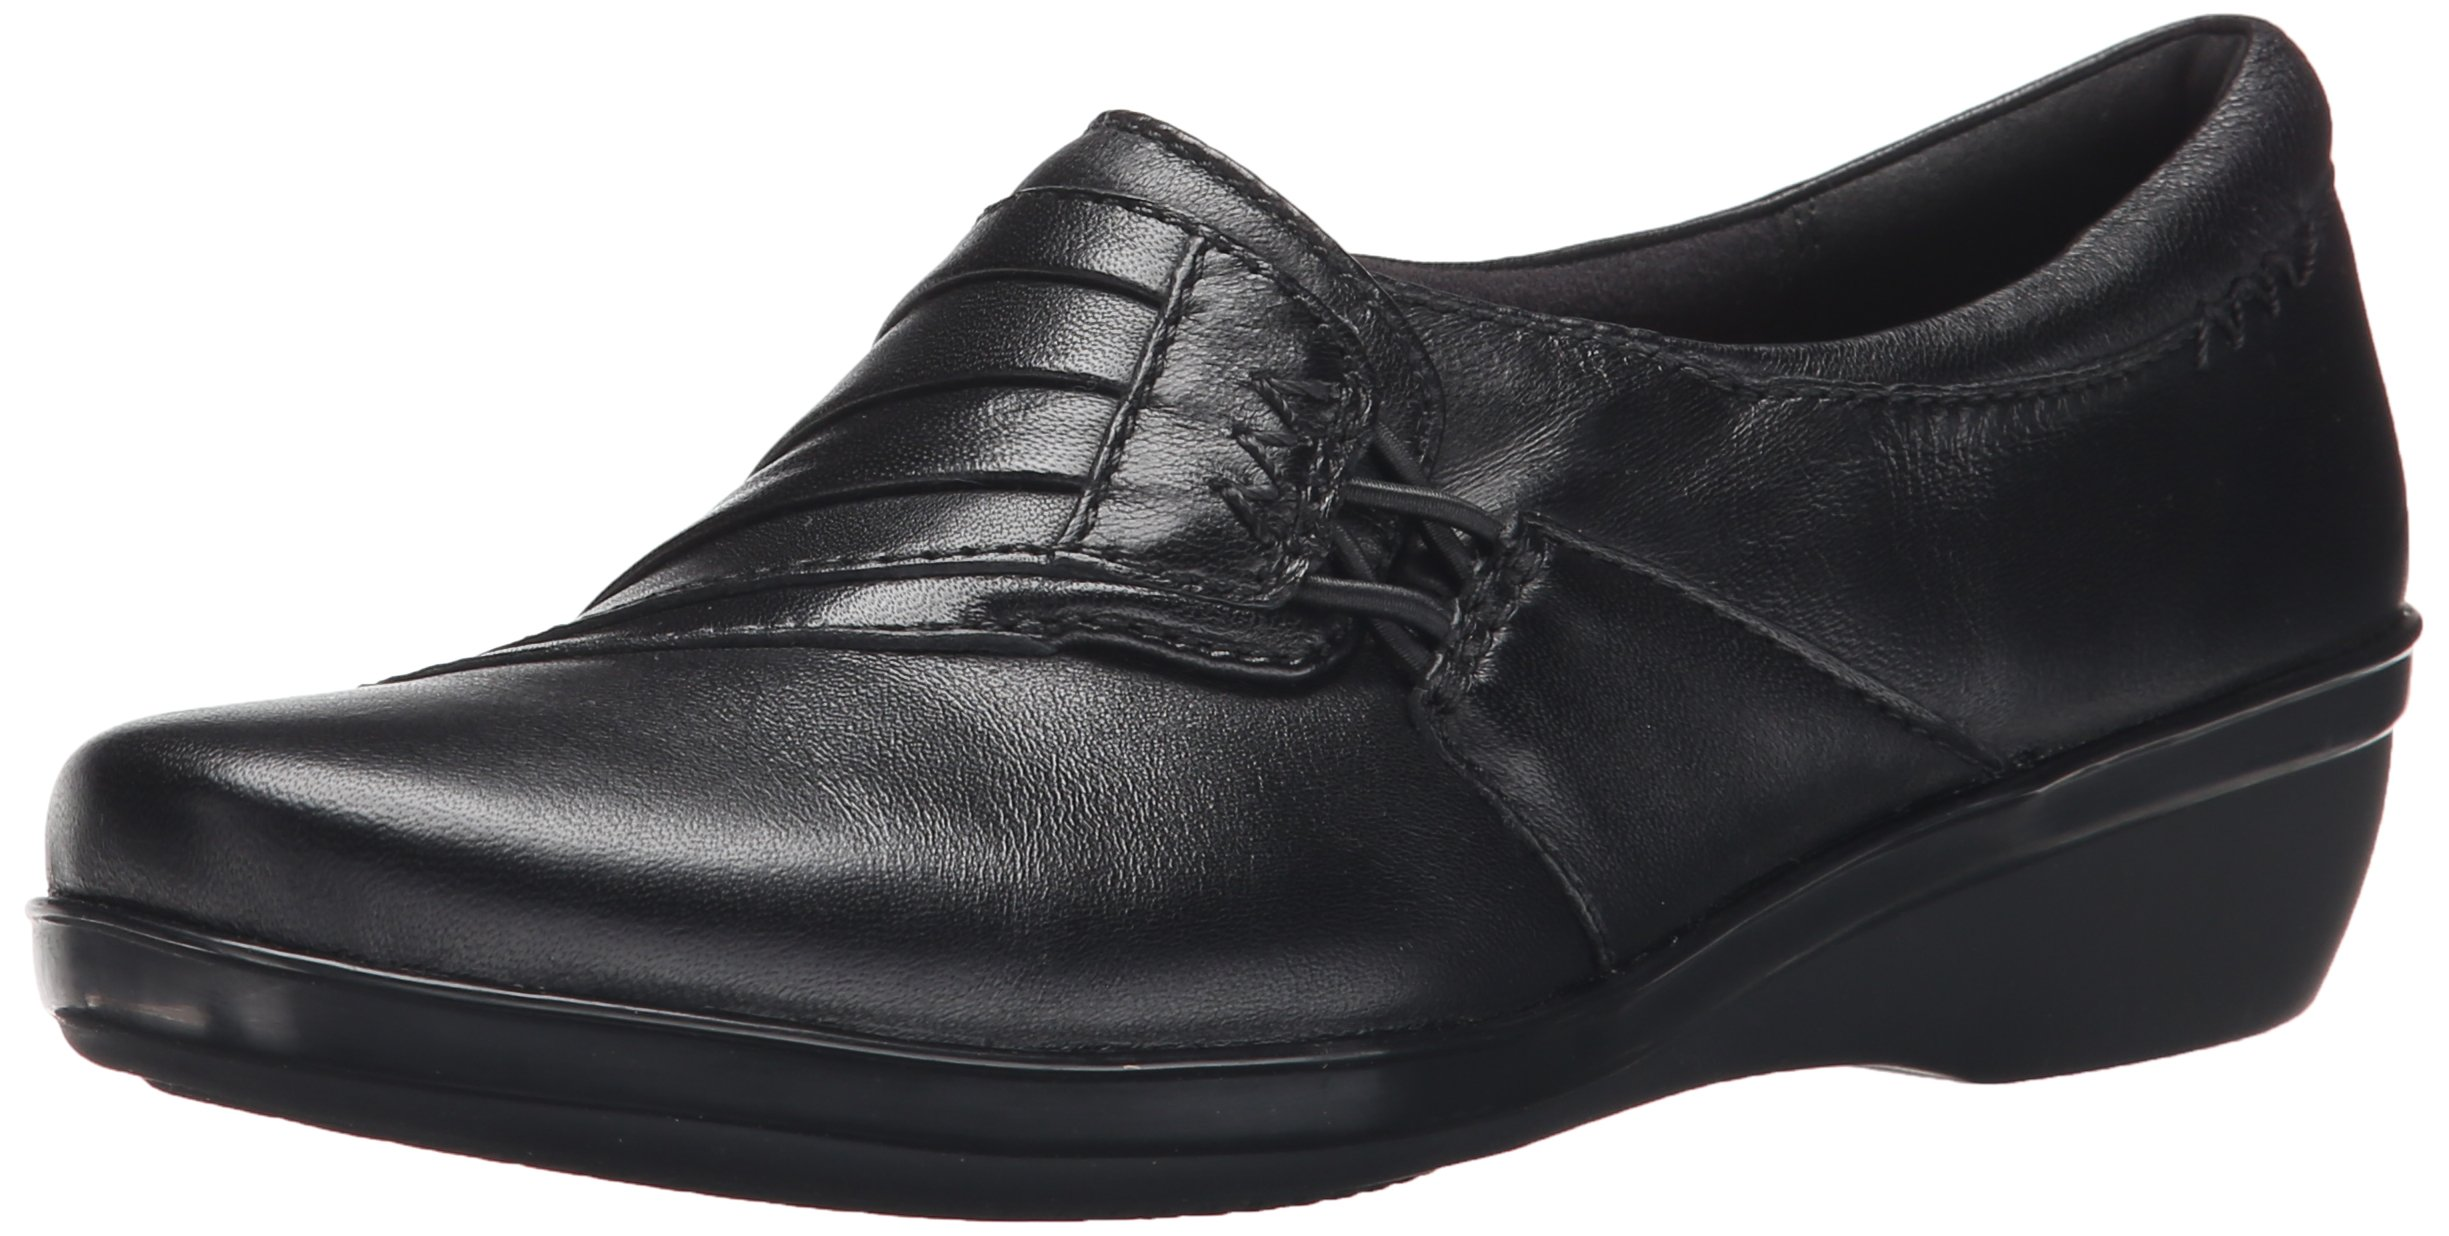 CLARKS Women's Everlay Iris Slip-on Loafer, Black Leather, 8 W US